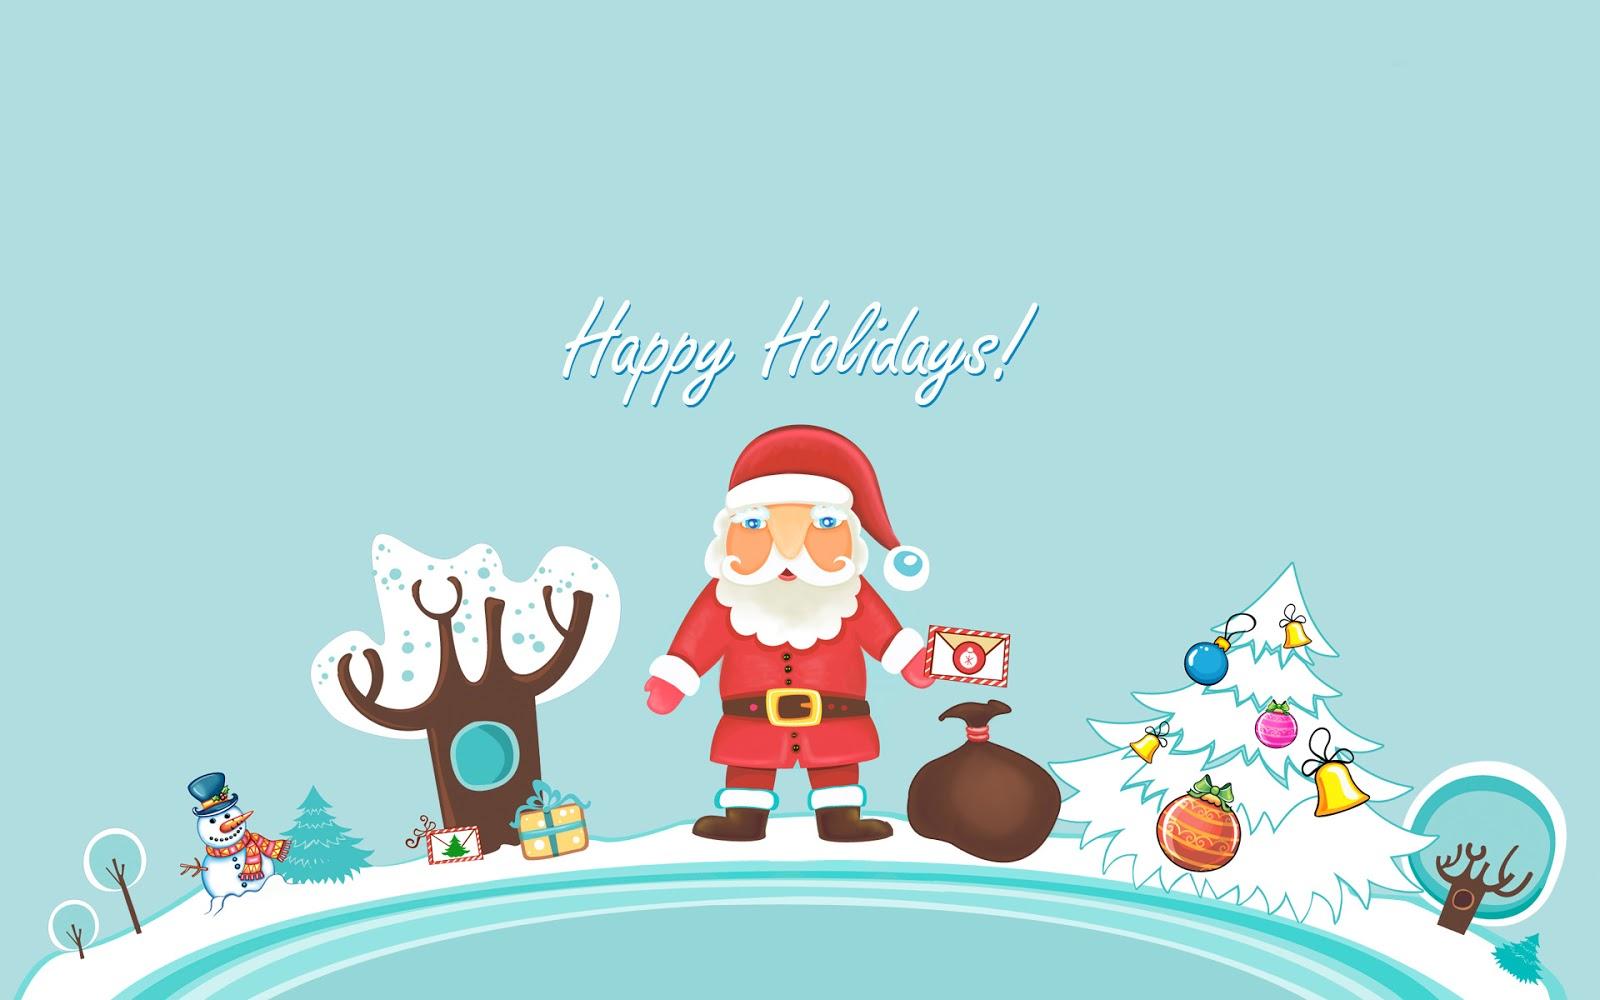 Wallpaper Happy Holidays Hd Celebrations Christmas 5116: HD Wallpaper Download: Happy Merry Christmas